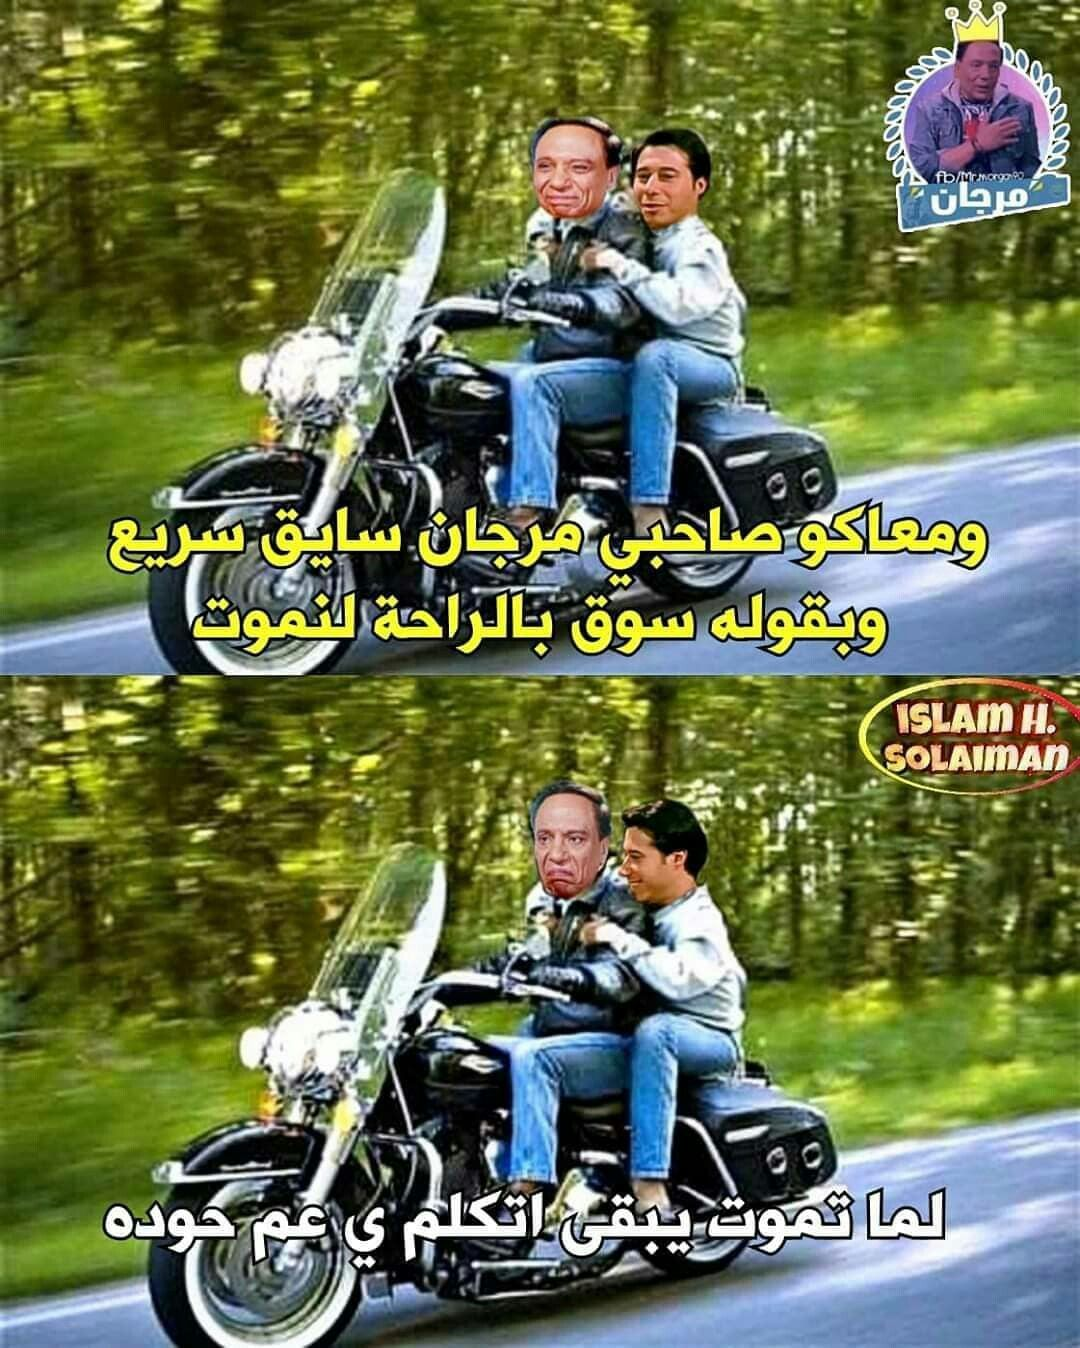 Pin by Salah Kullab on اضحك يا نكدي in 2020 | Open wheel ...